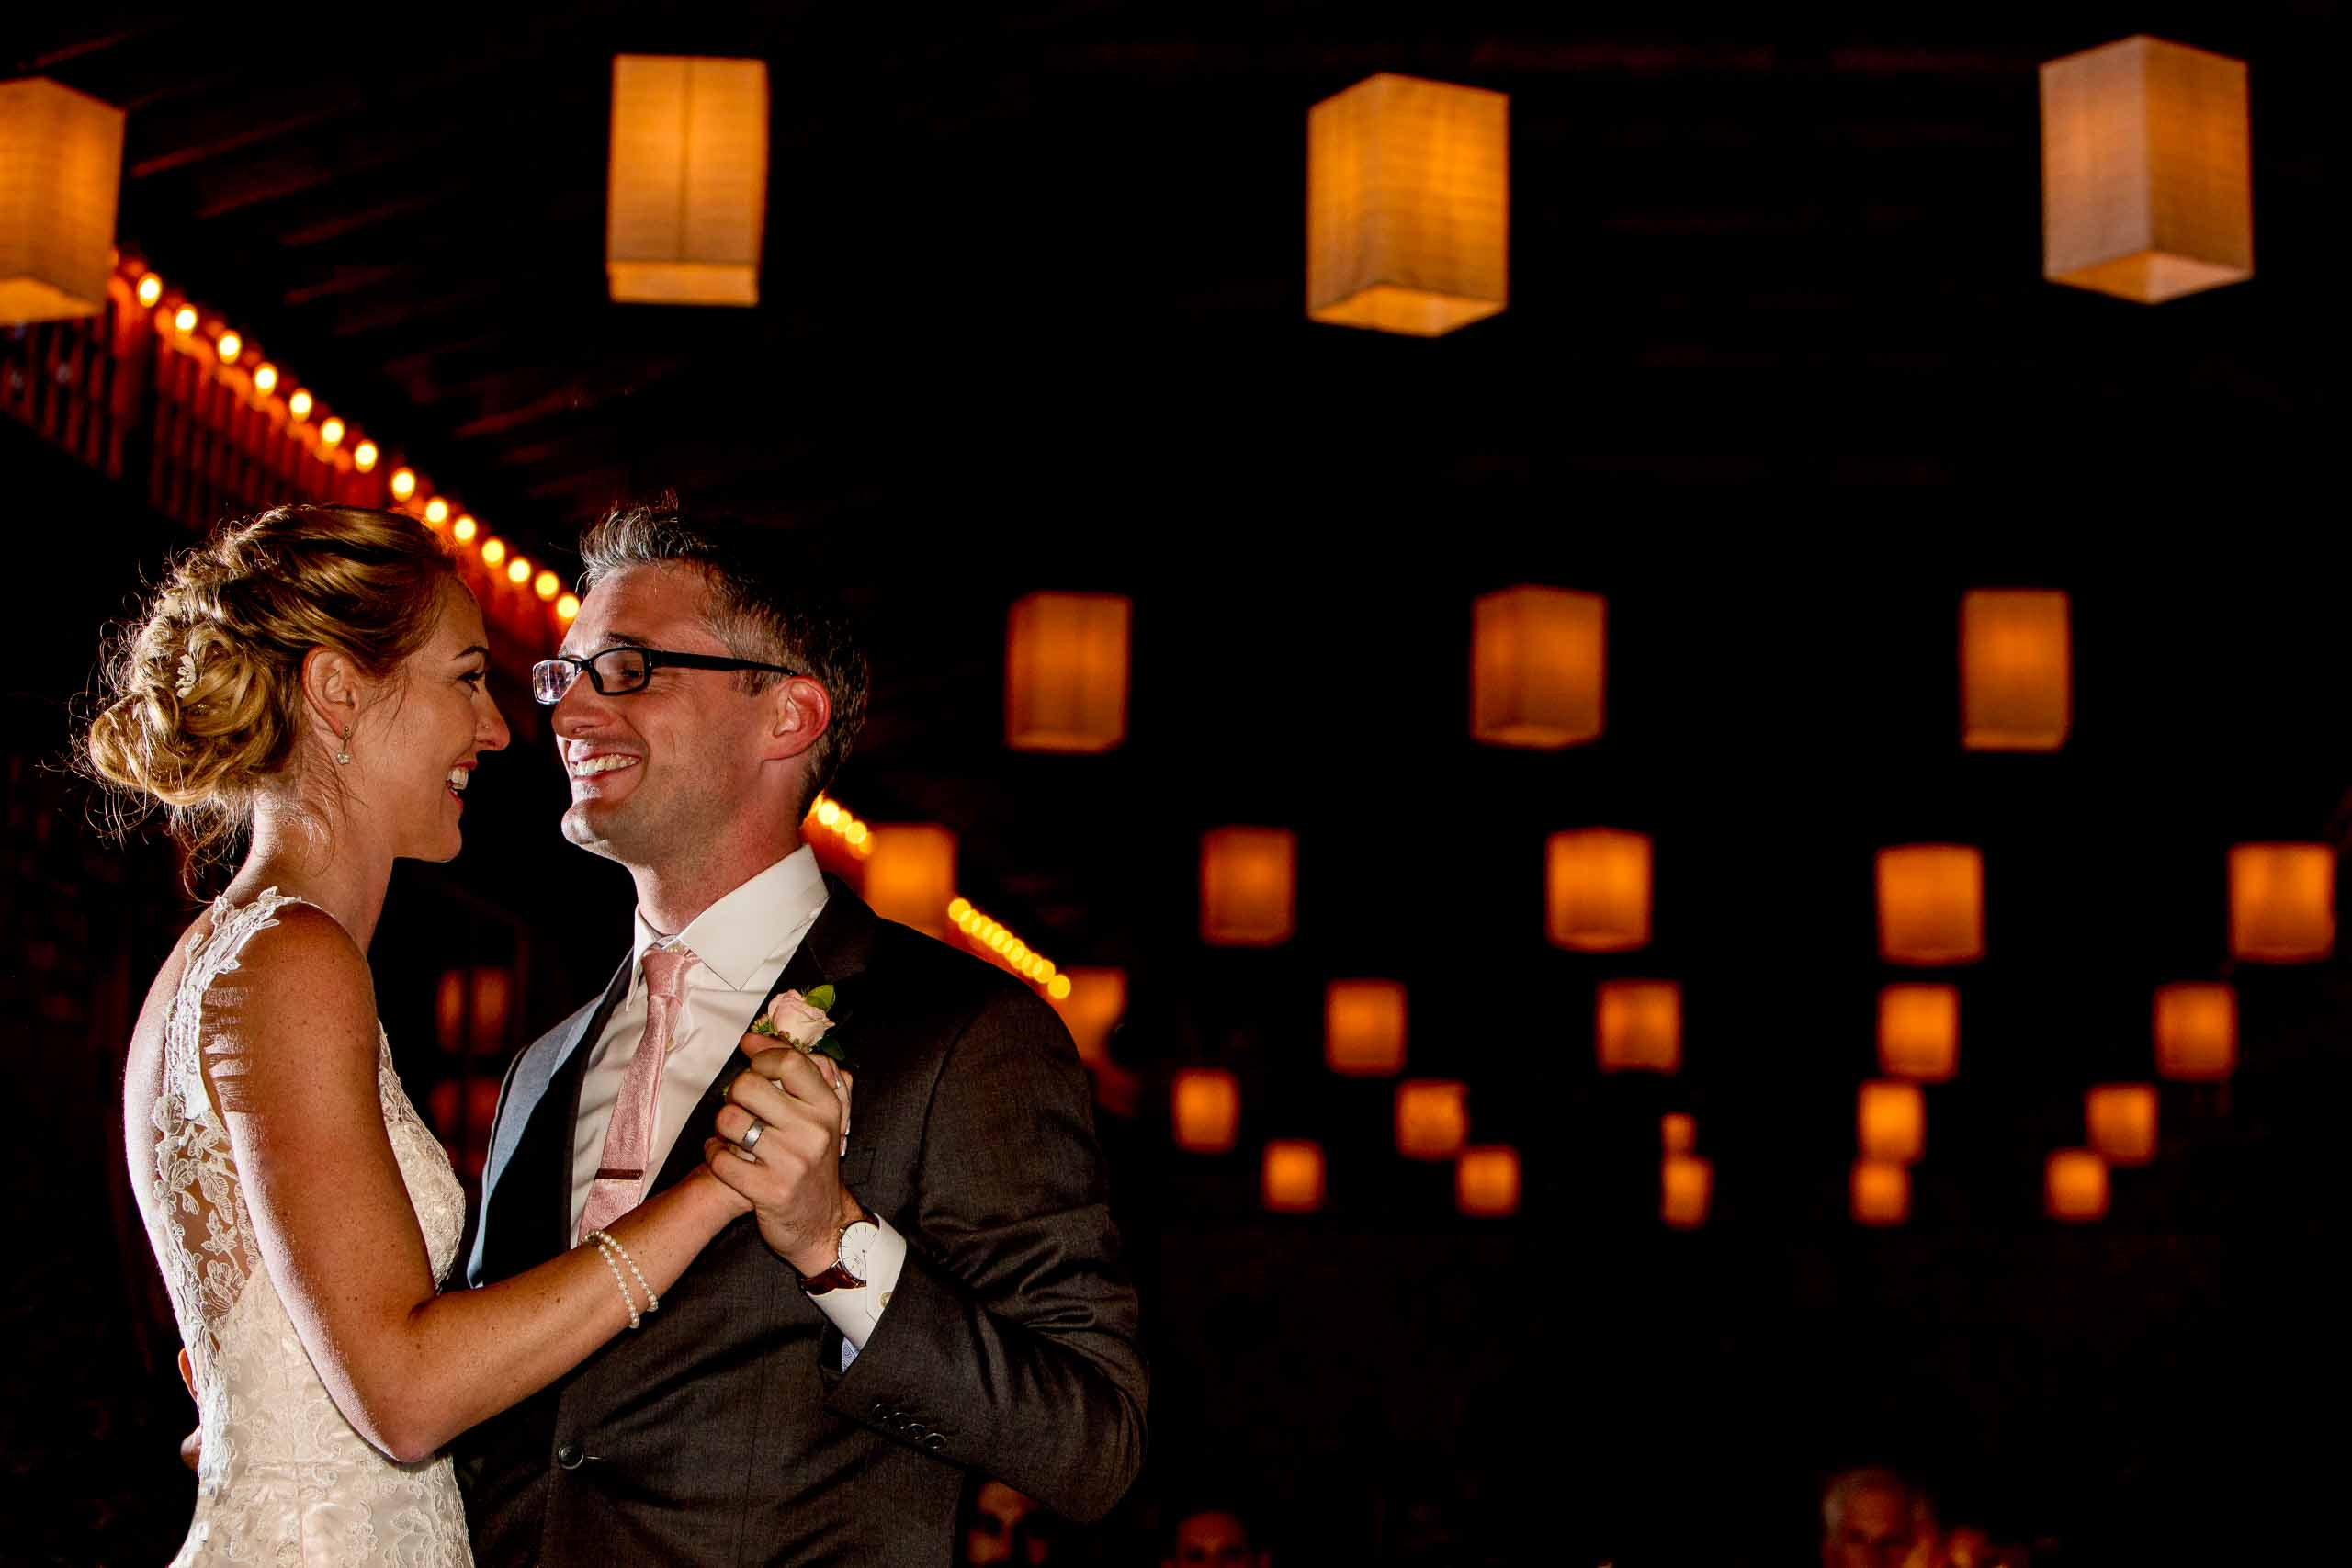 Bride and groom first dance at their Mt Hood Organic Farms wedding reception near Hood River Oregon